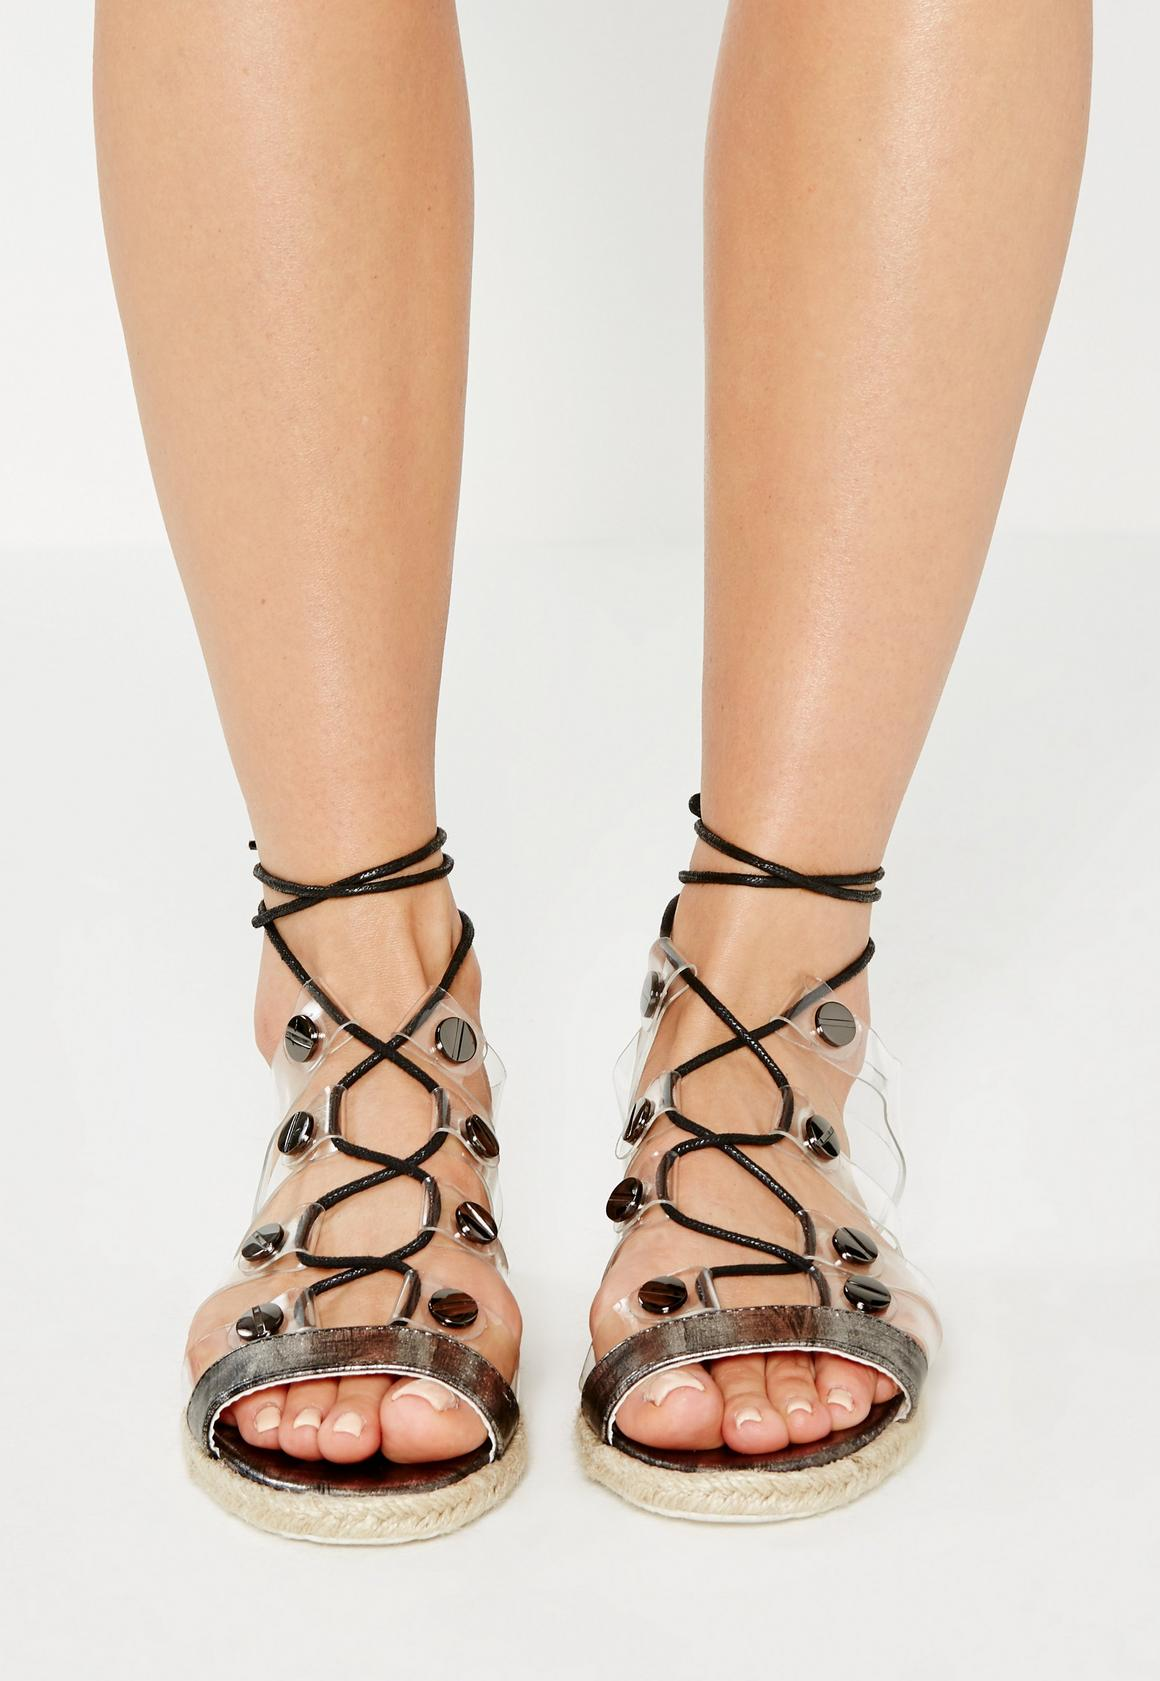 Black sandals with straps - Previous Next